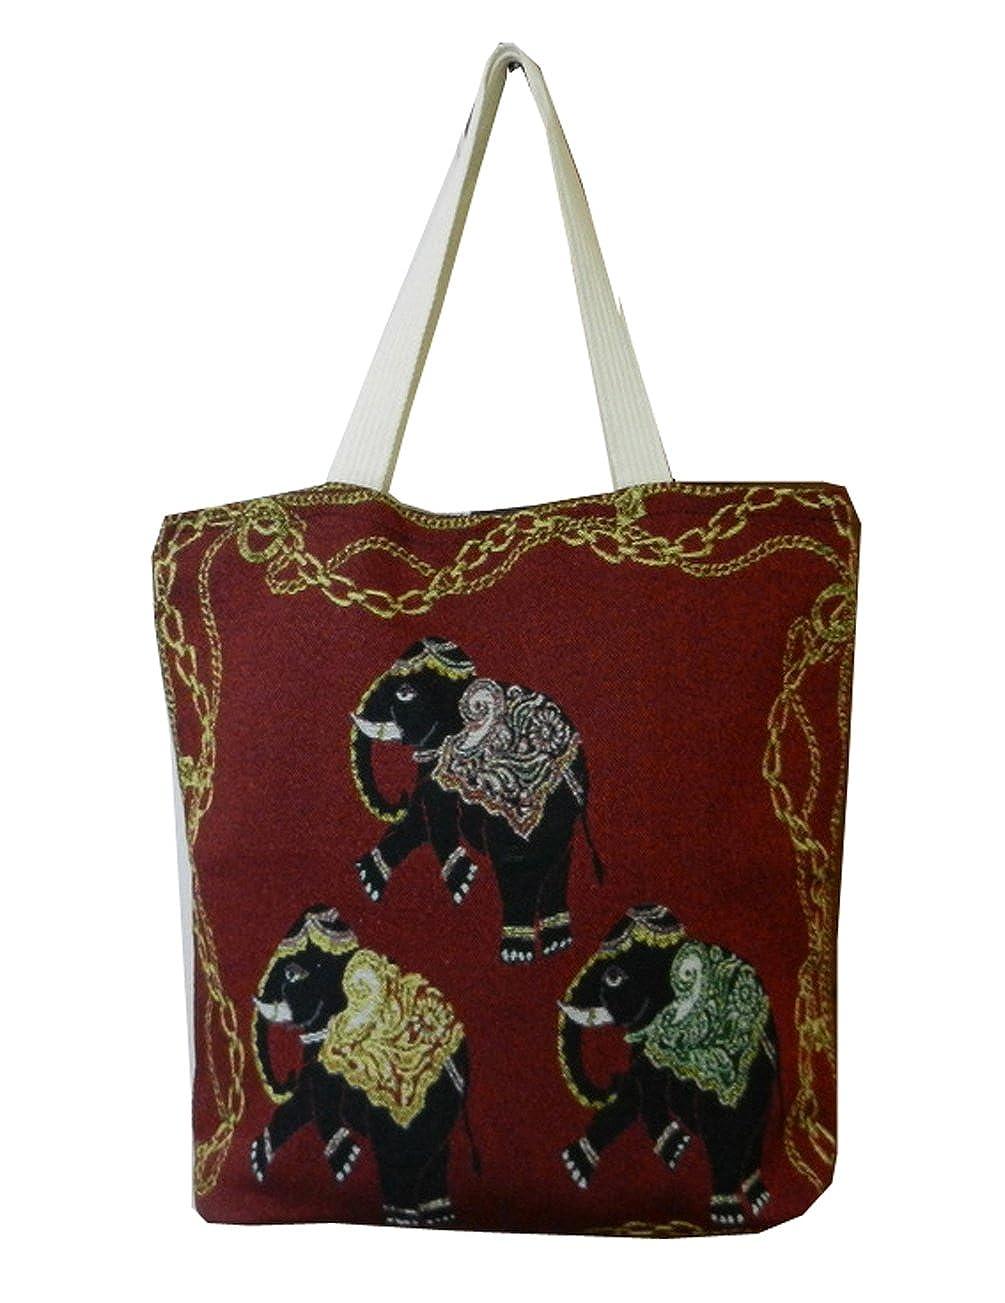 0717643ff46f BTP! Ethnic Thai Elephant Tote Beach Bag Simplicity Handbag Canvas Cotton  Purse - More Design